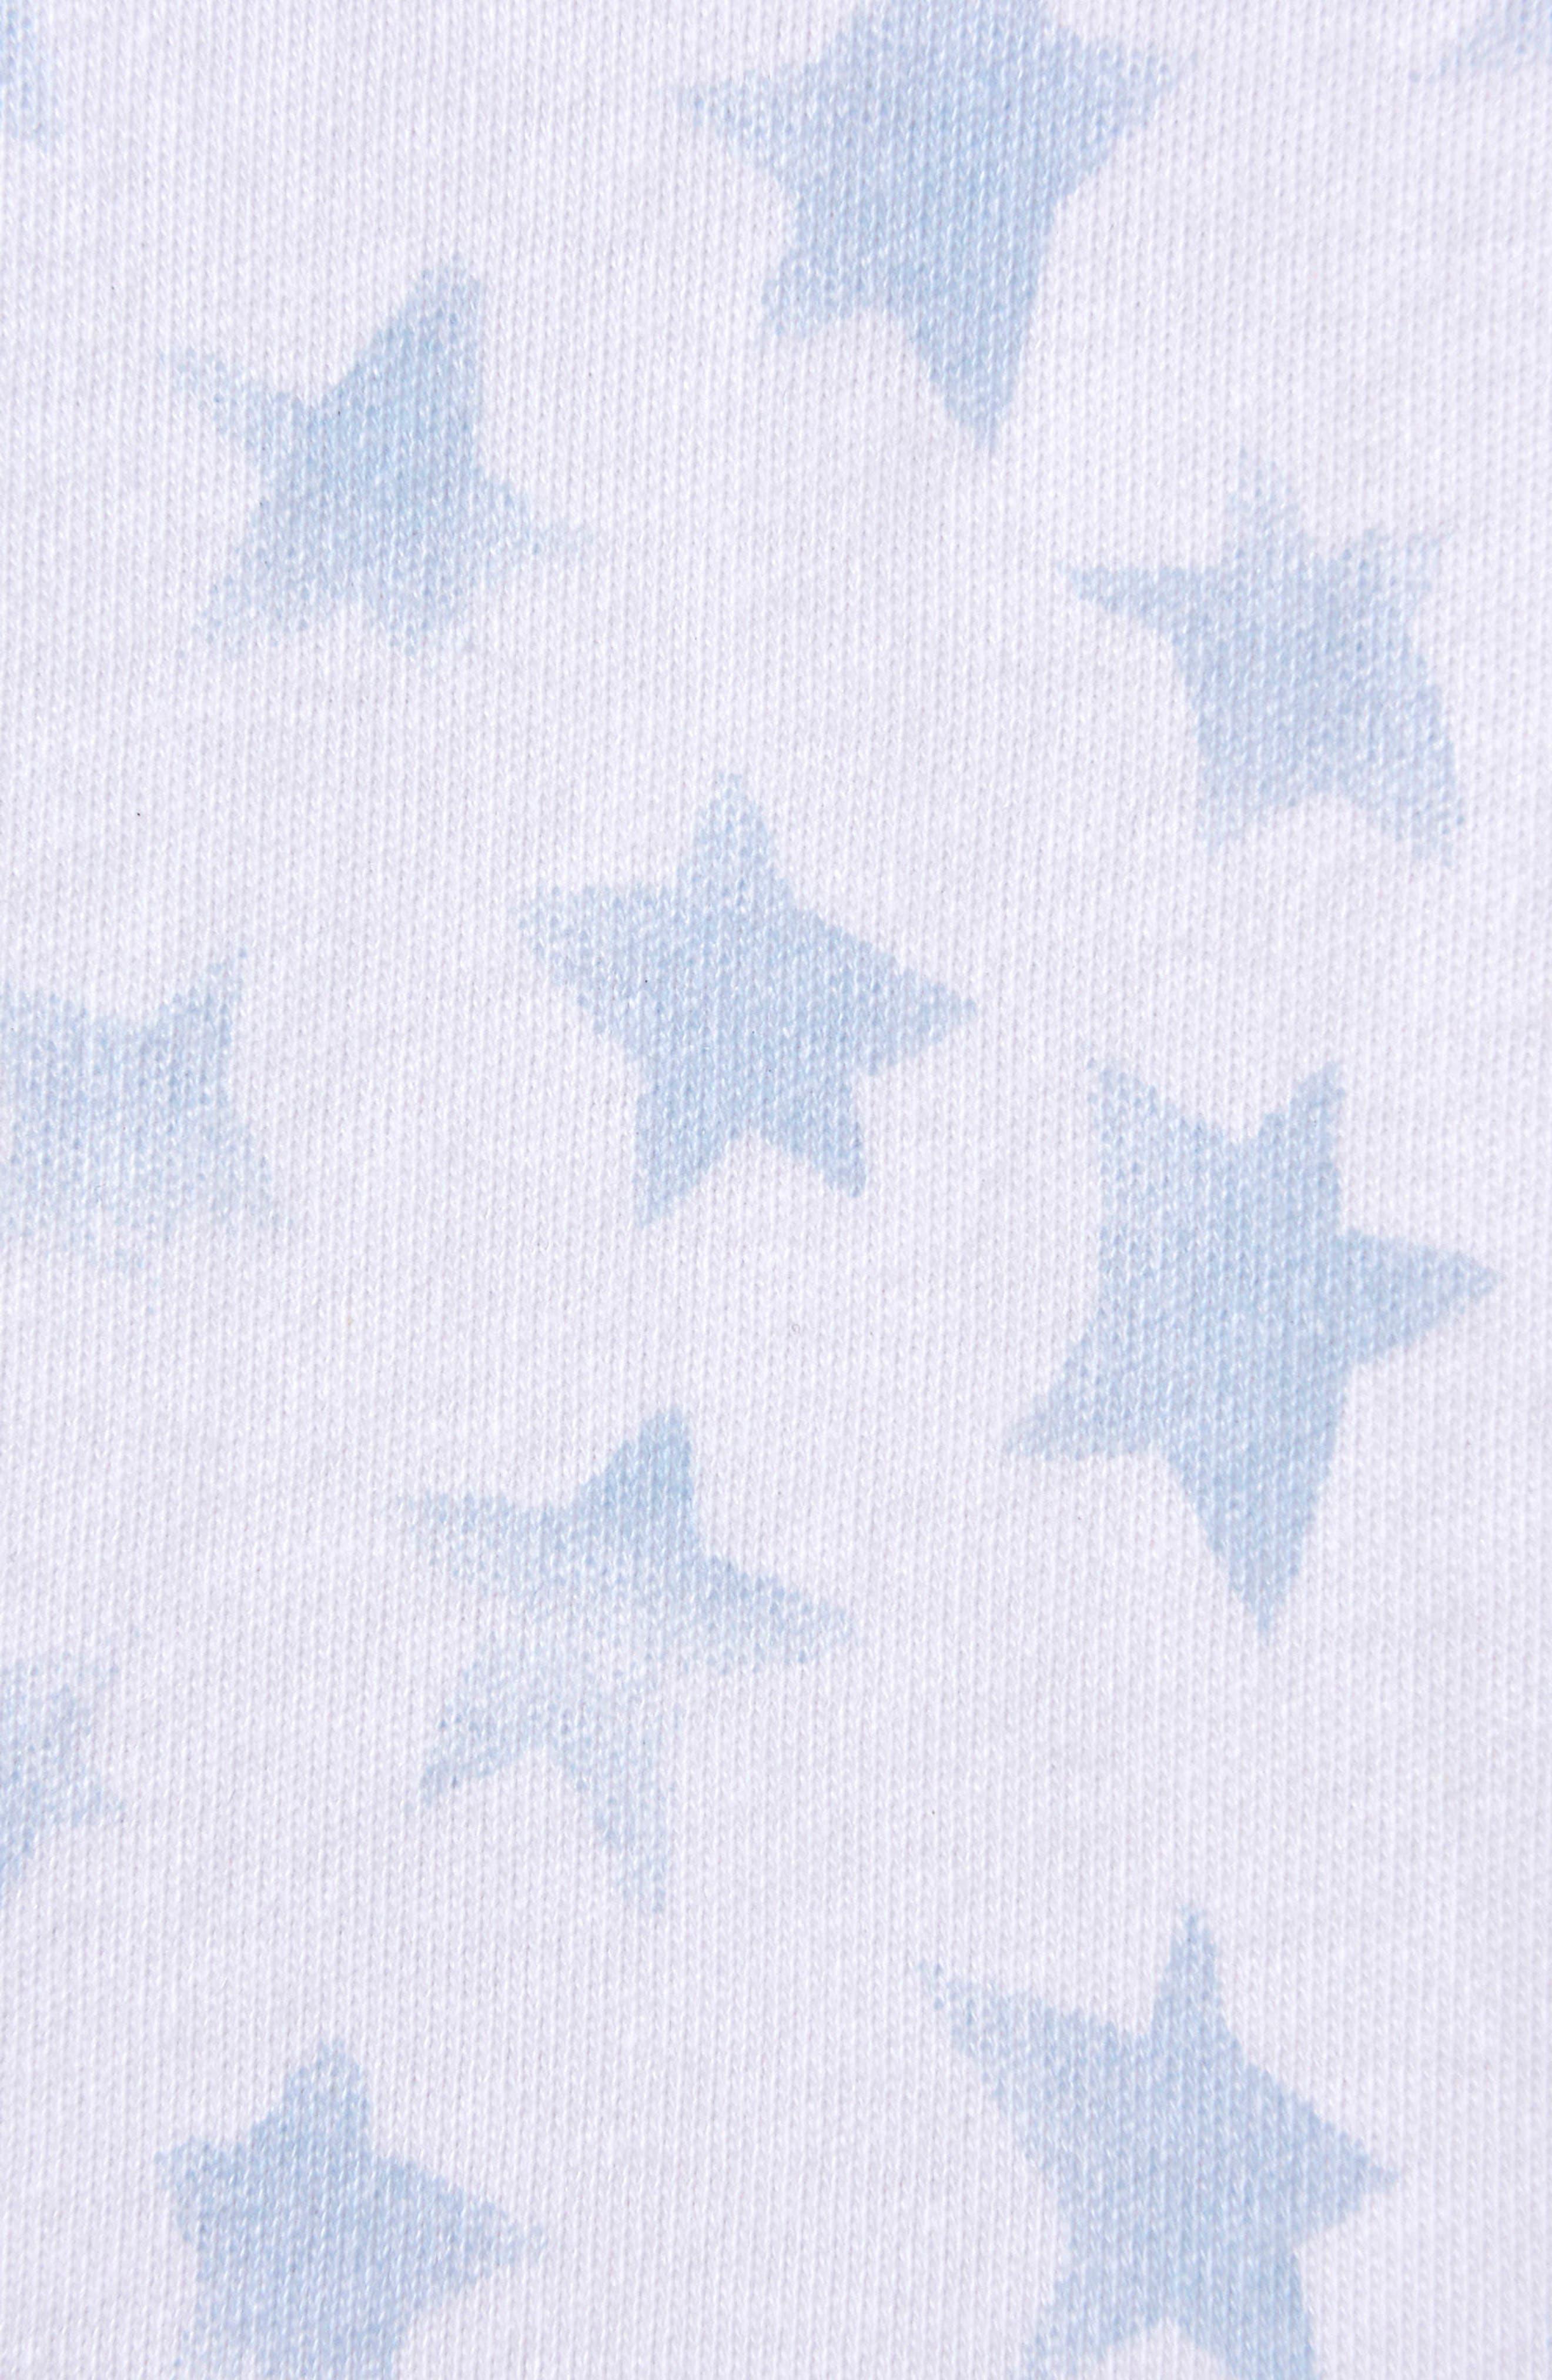 Platinum Series SleepSack<sup>™</sup> Swaddle,                             Alternate thumbnail 6, color,                             Pale Blue Twinkle